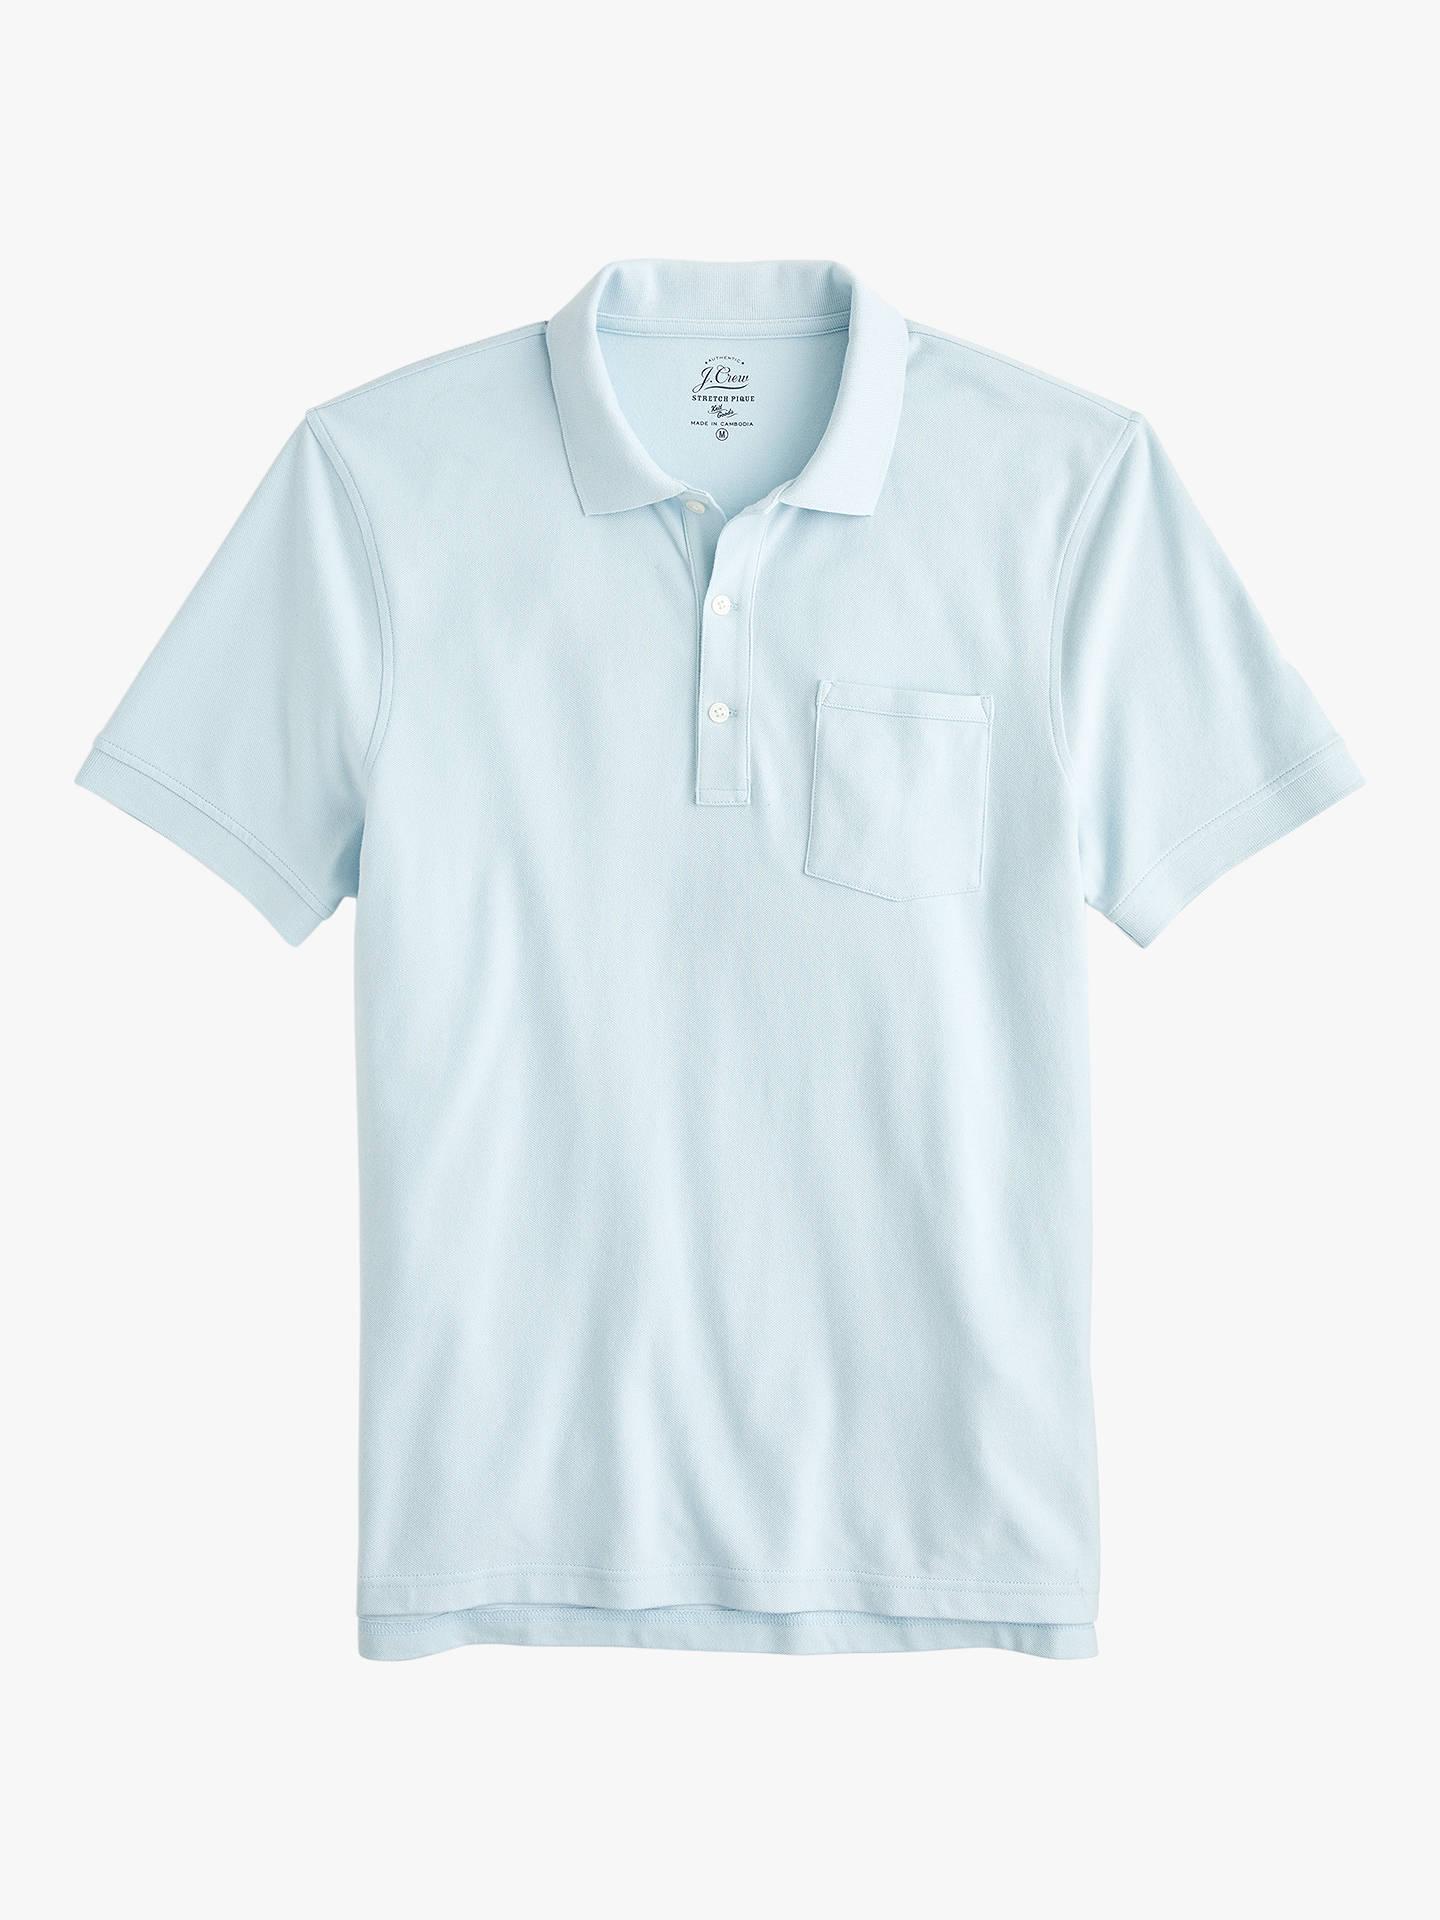 c23671818 Buy J.Crew Stretch Pique Short Sleeve Polo Shirt, Classic Sky, XXXXL Online